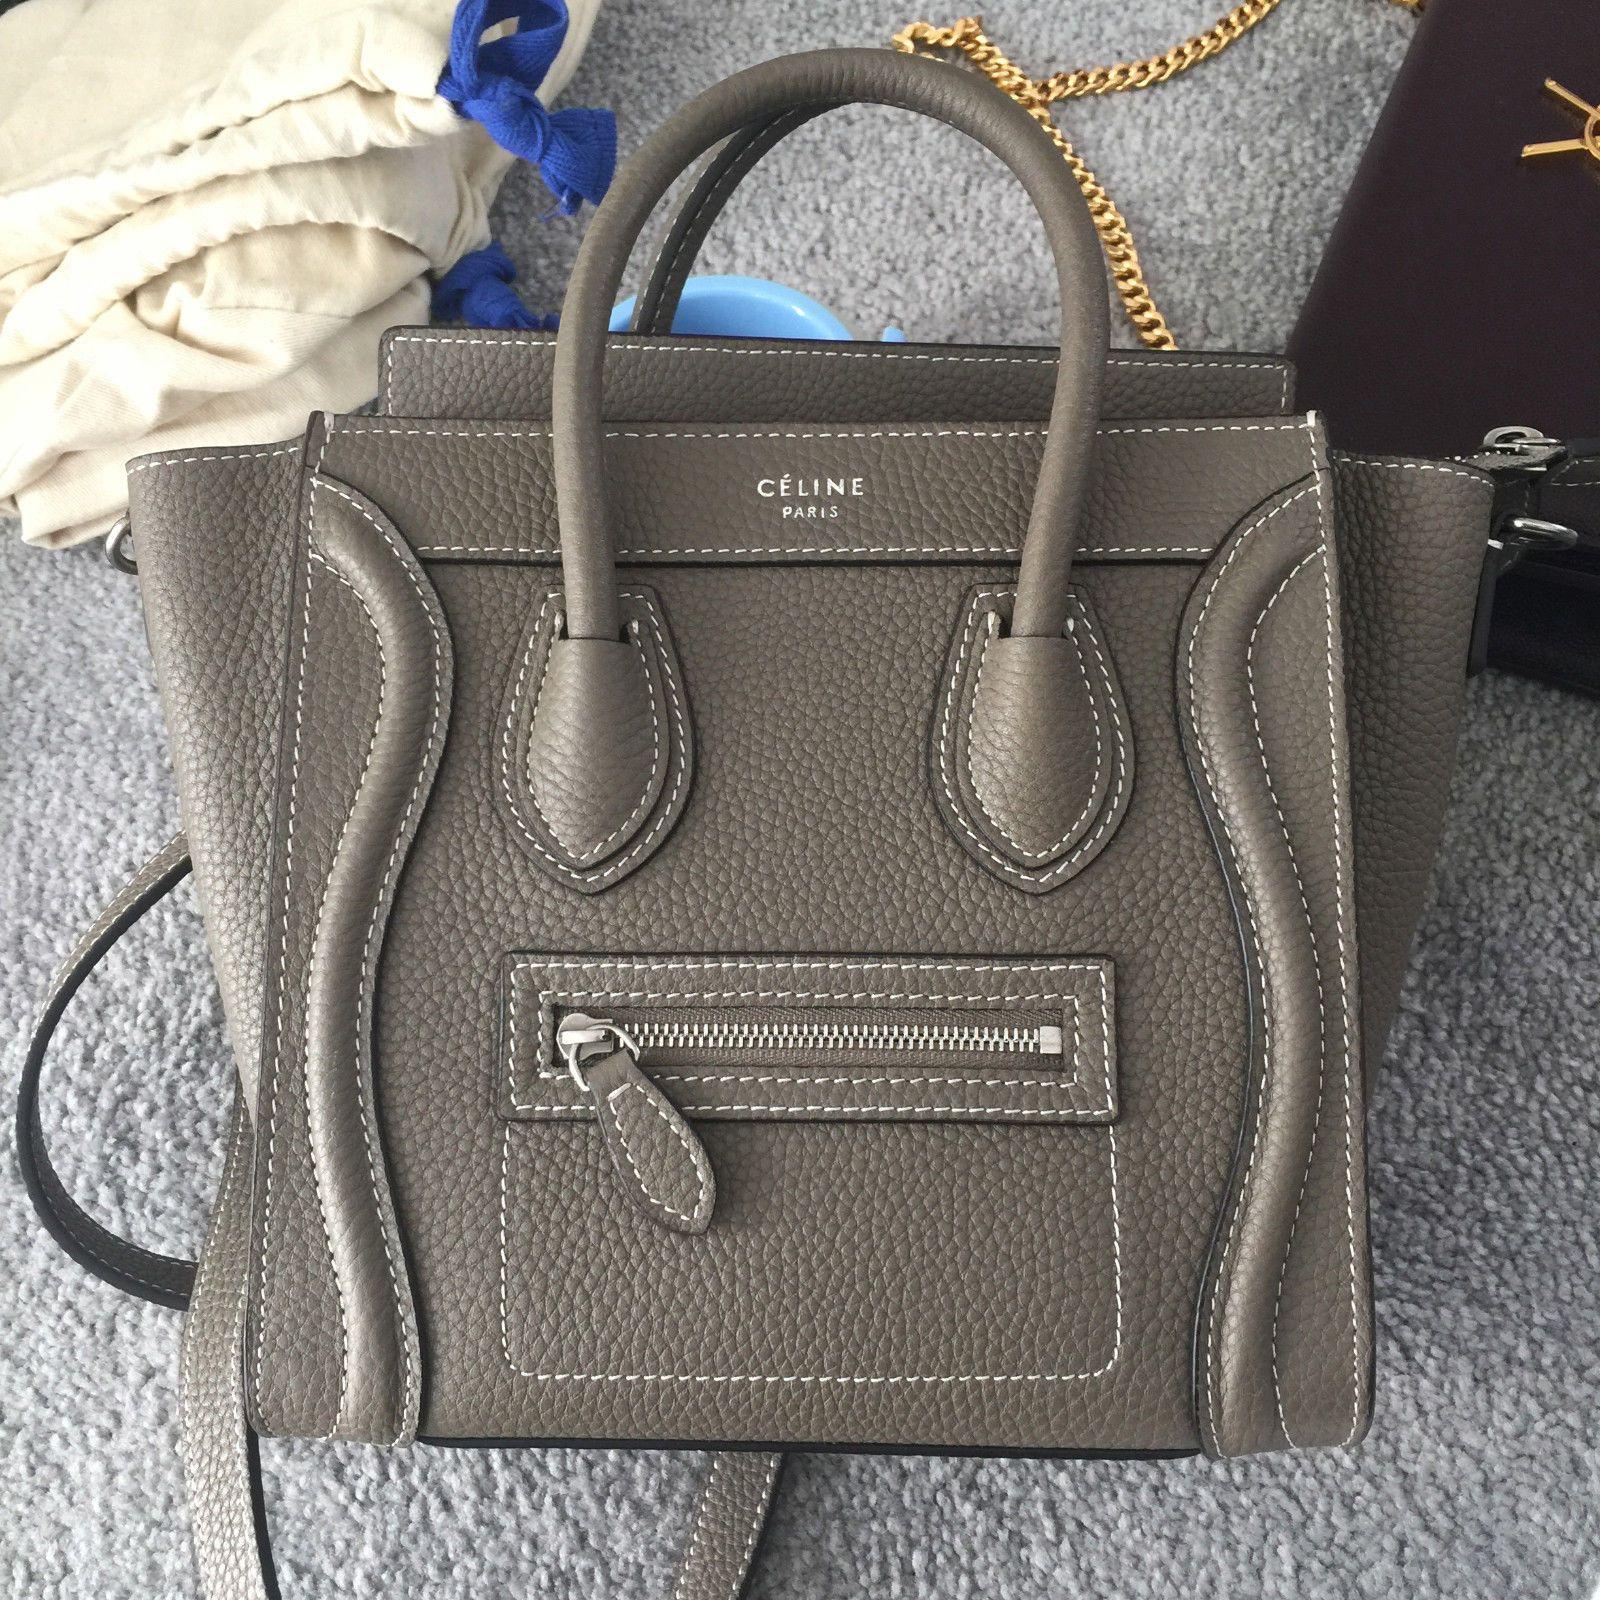 AUTH CELINE NANO LUGGAGE BAG IN DRUMMED CALFSKIN SOURIS gray mini ... 1b87c71de5fc9